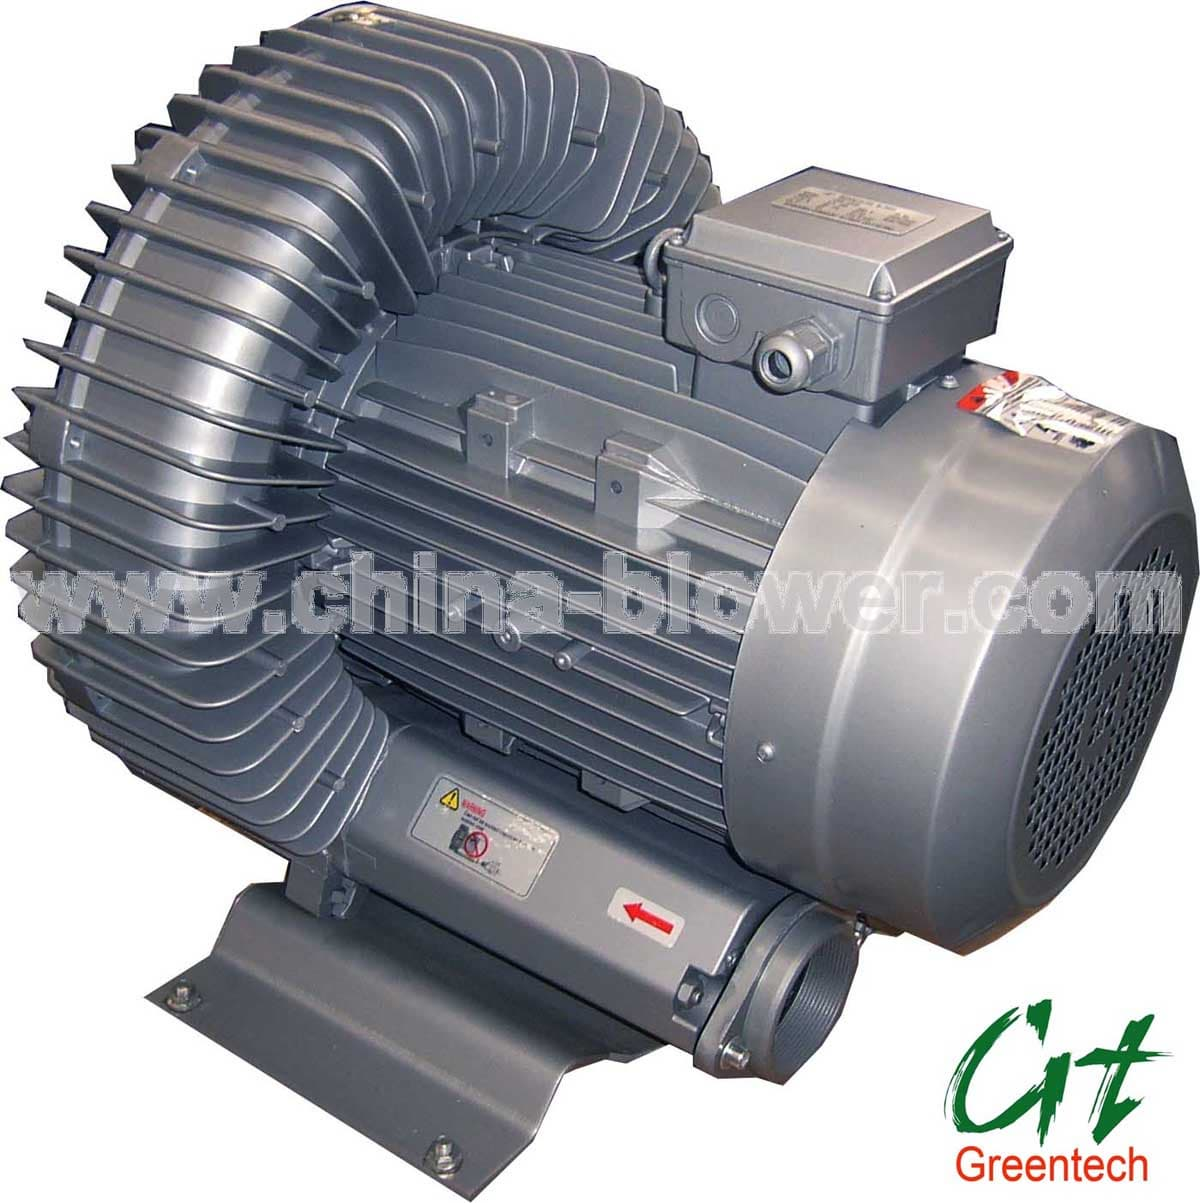 Miniature Regenerative Blowers : Regenerative blower from greentech international zhangqiu